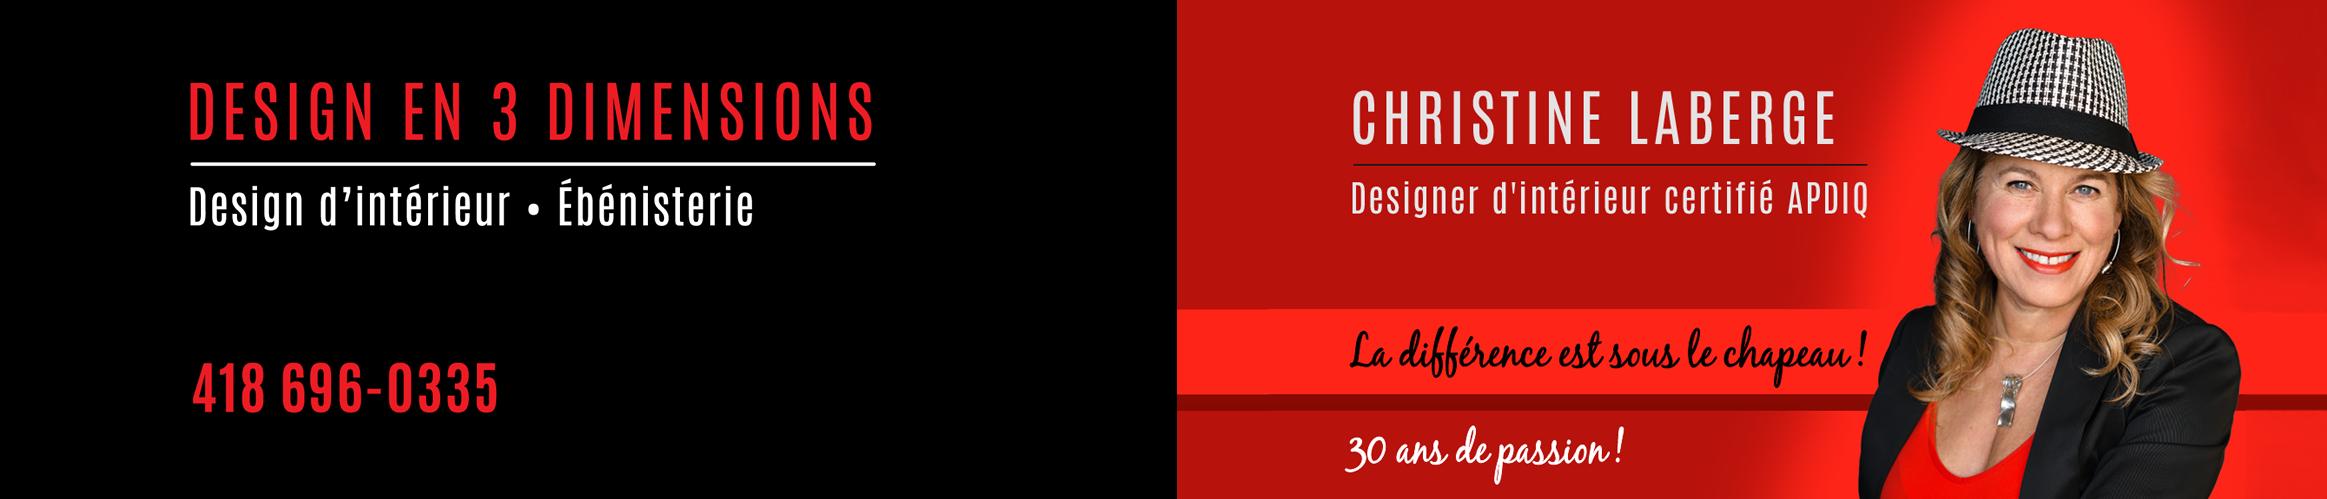 Design En 3 Dimensions Logo